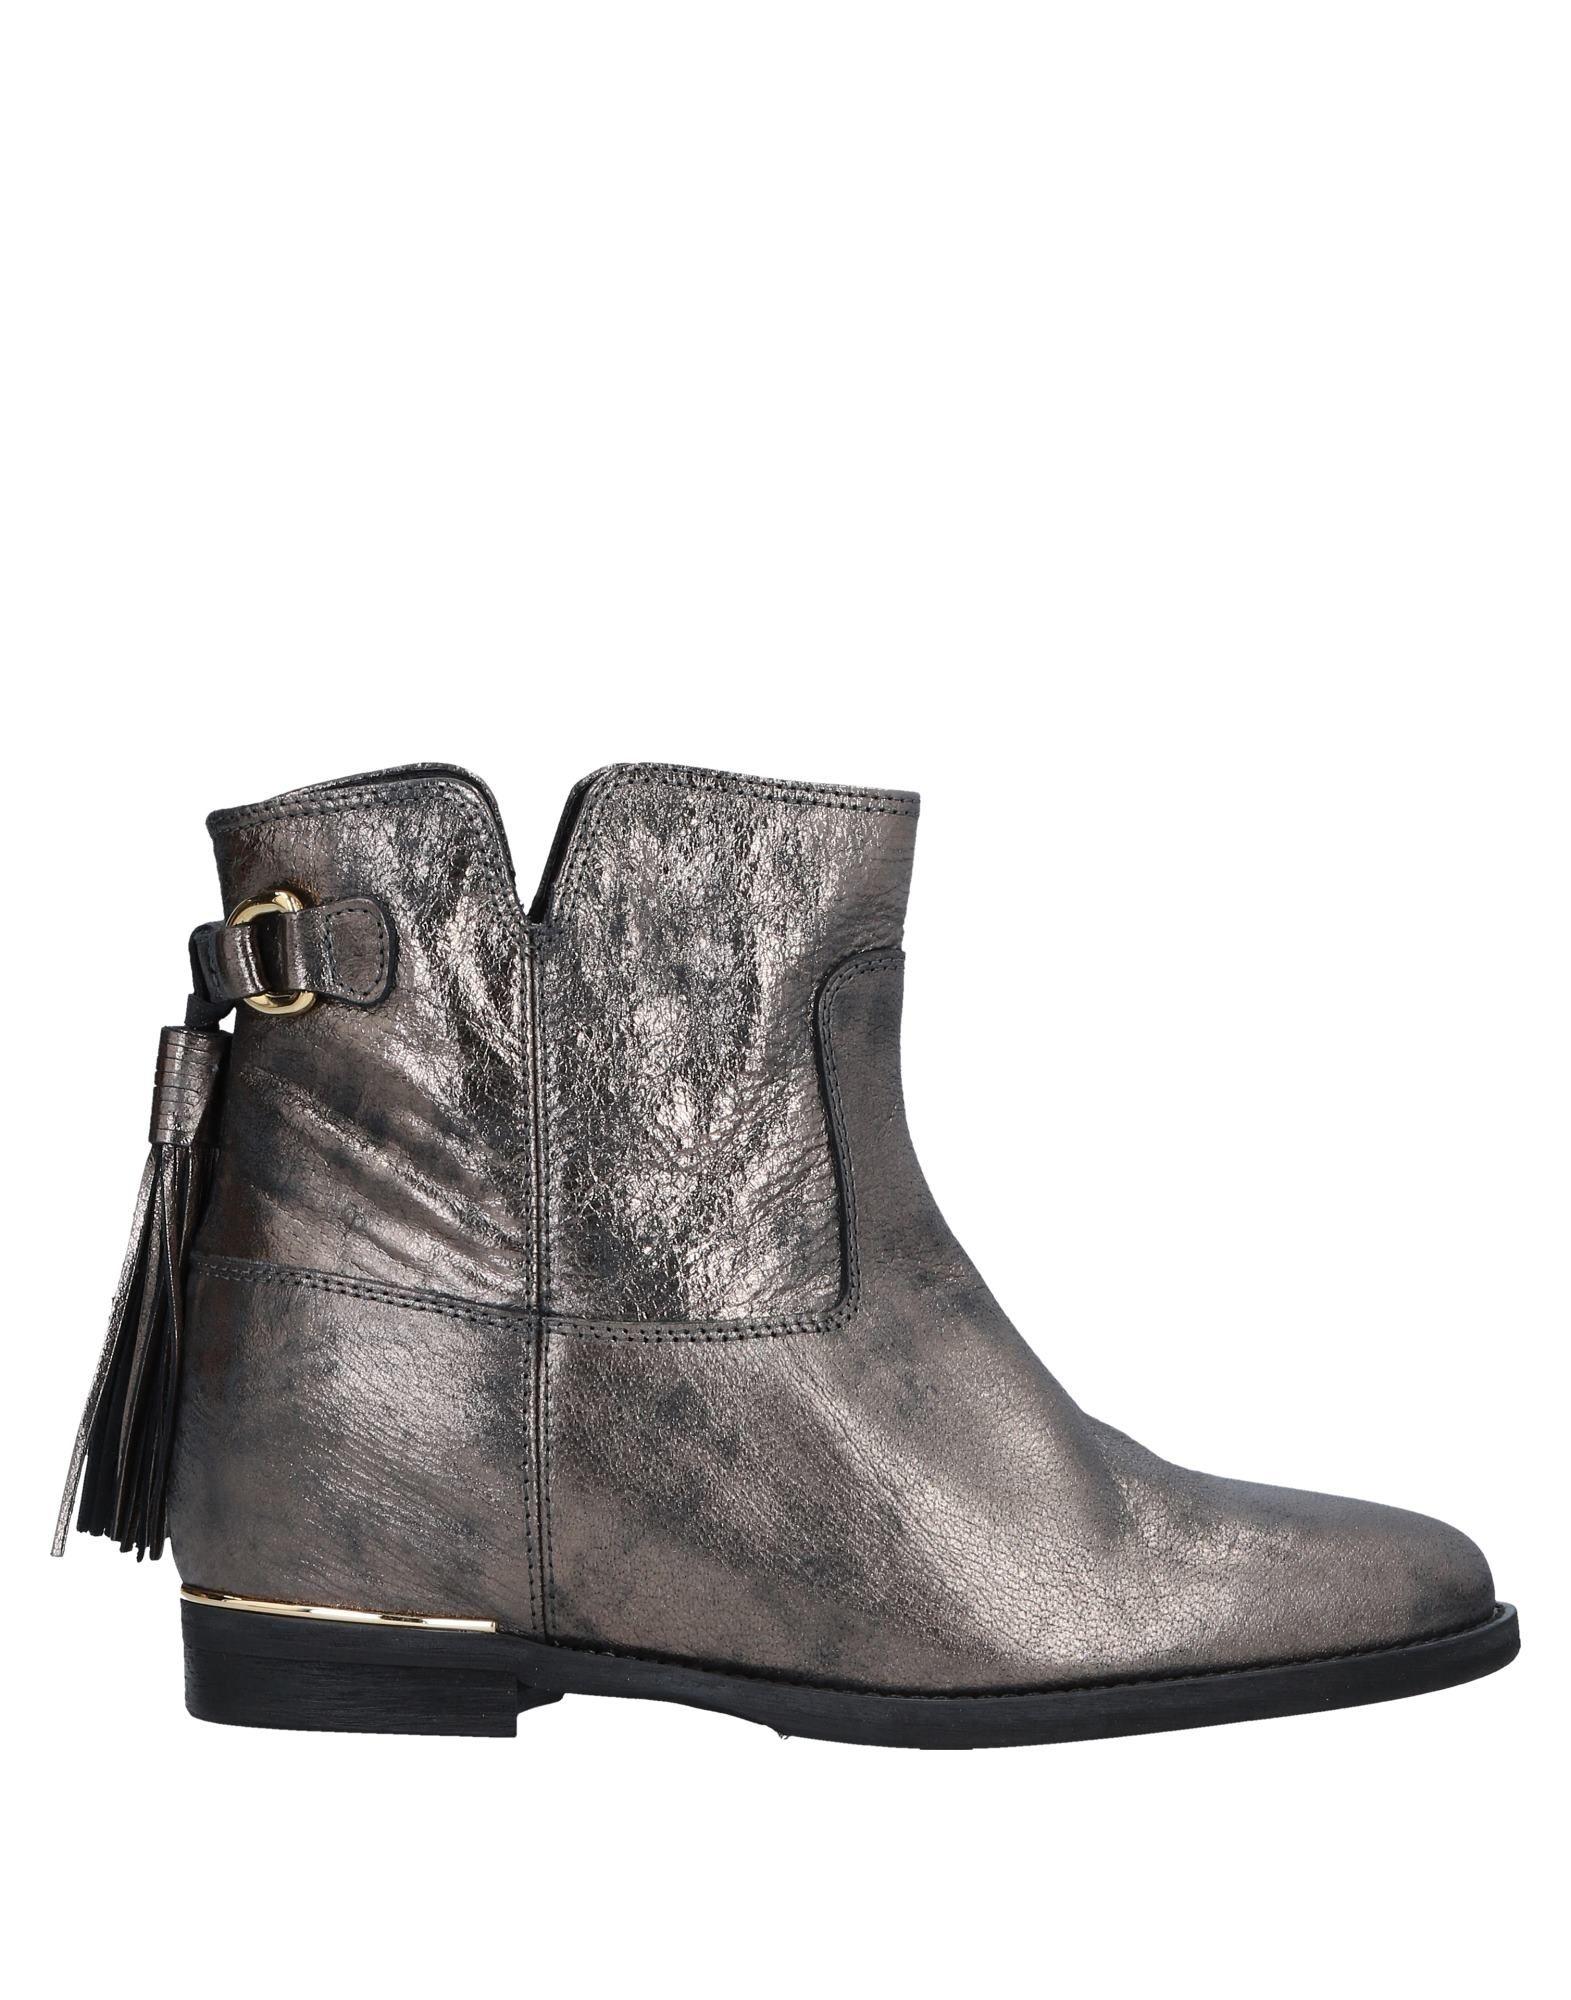 Lamica Gute Stiefelette Damen  11537397GJ Gute Lamica Qualität beliebte Schuhe 92d4b2